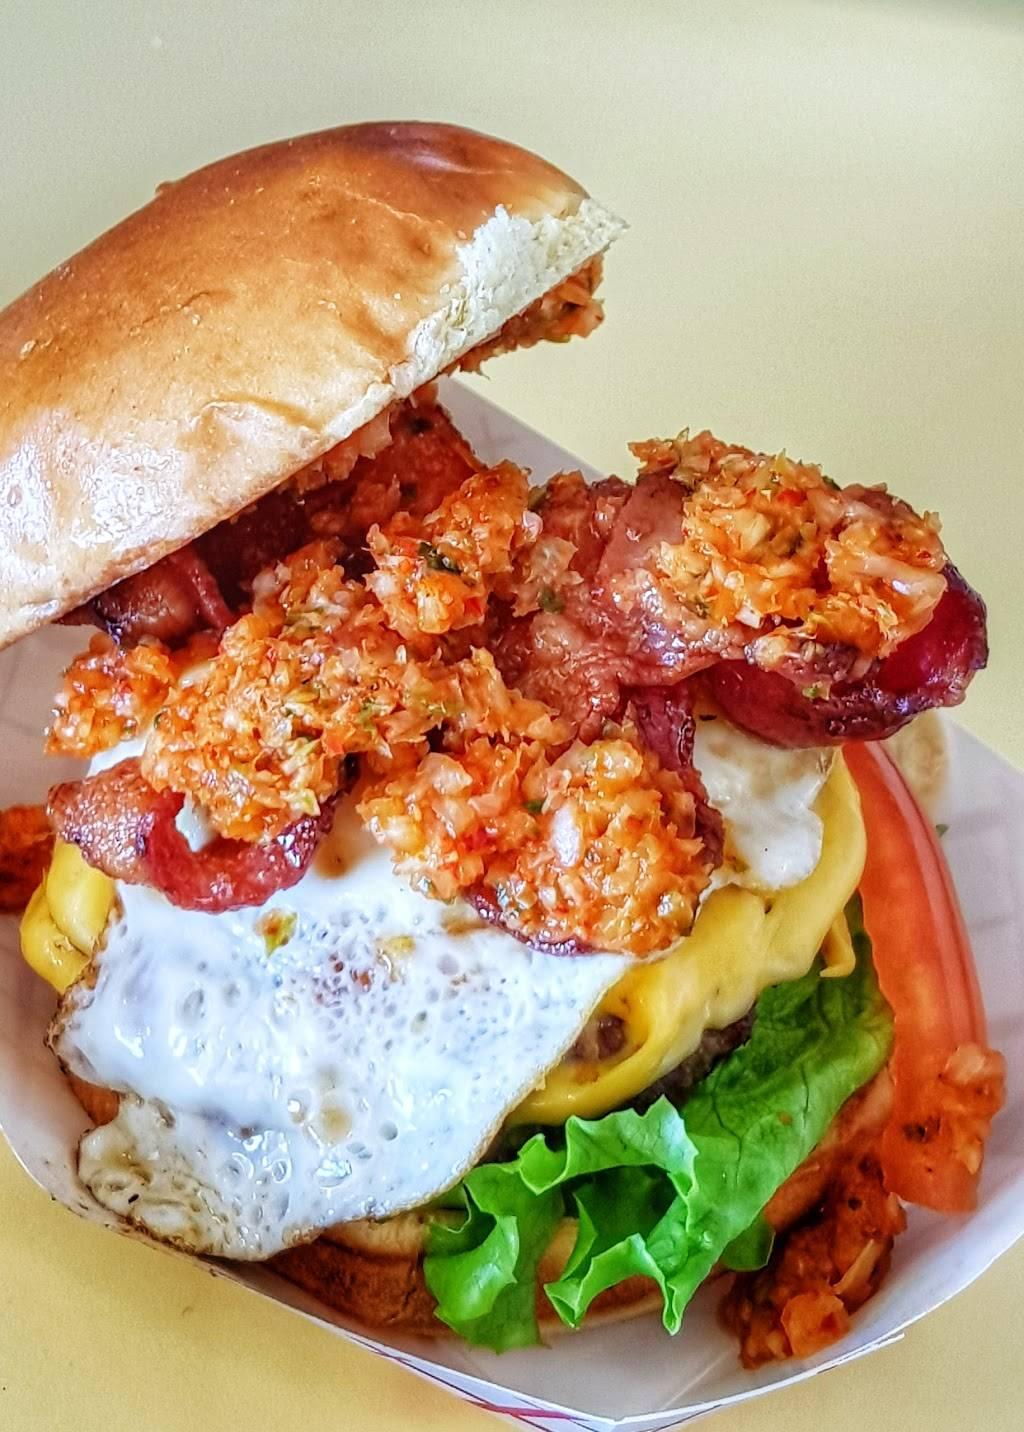 Boba Burger | restaurant | 8530 Waukegan Rd, Morton Grove, IL 60053, USA | 8474107779 OR +1 847-410-7779